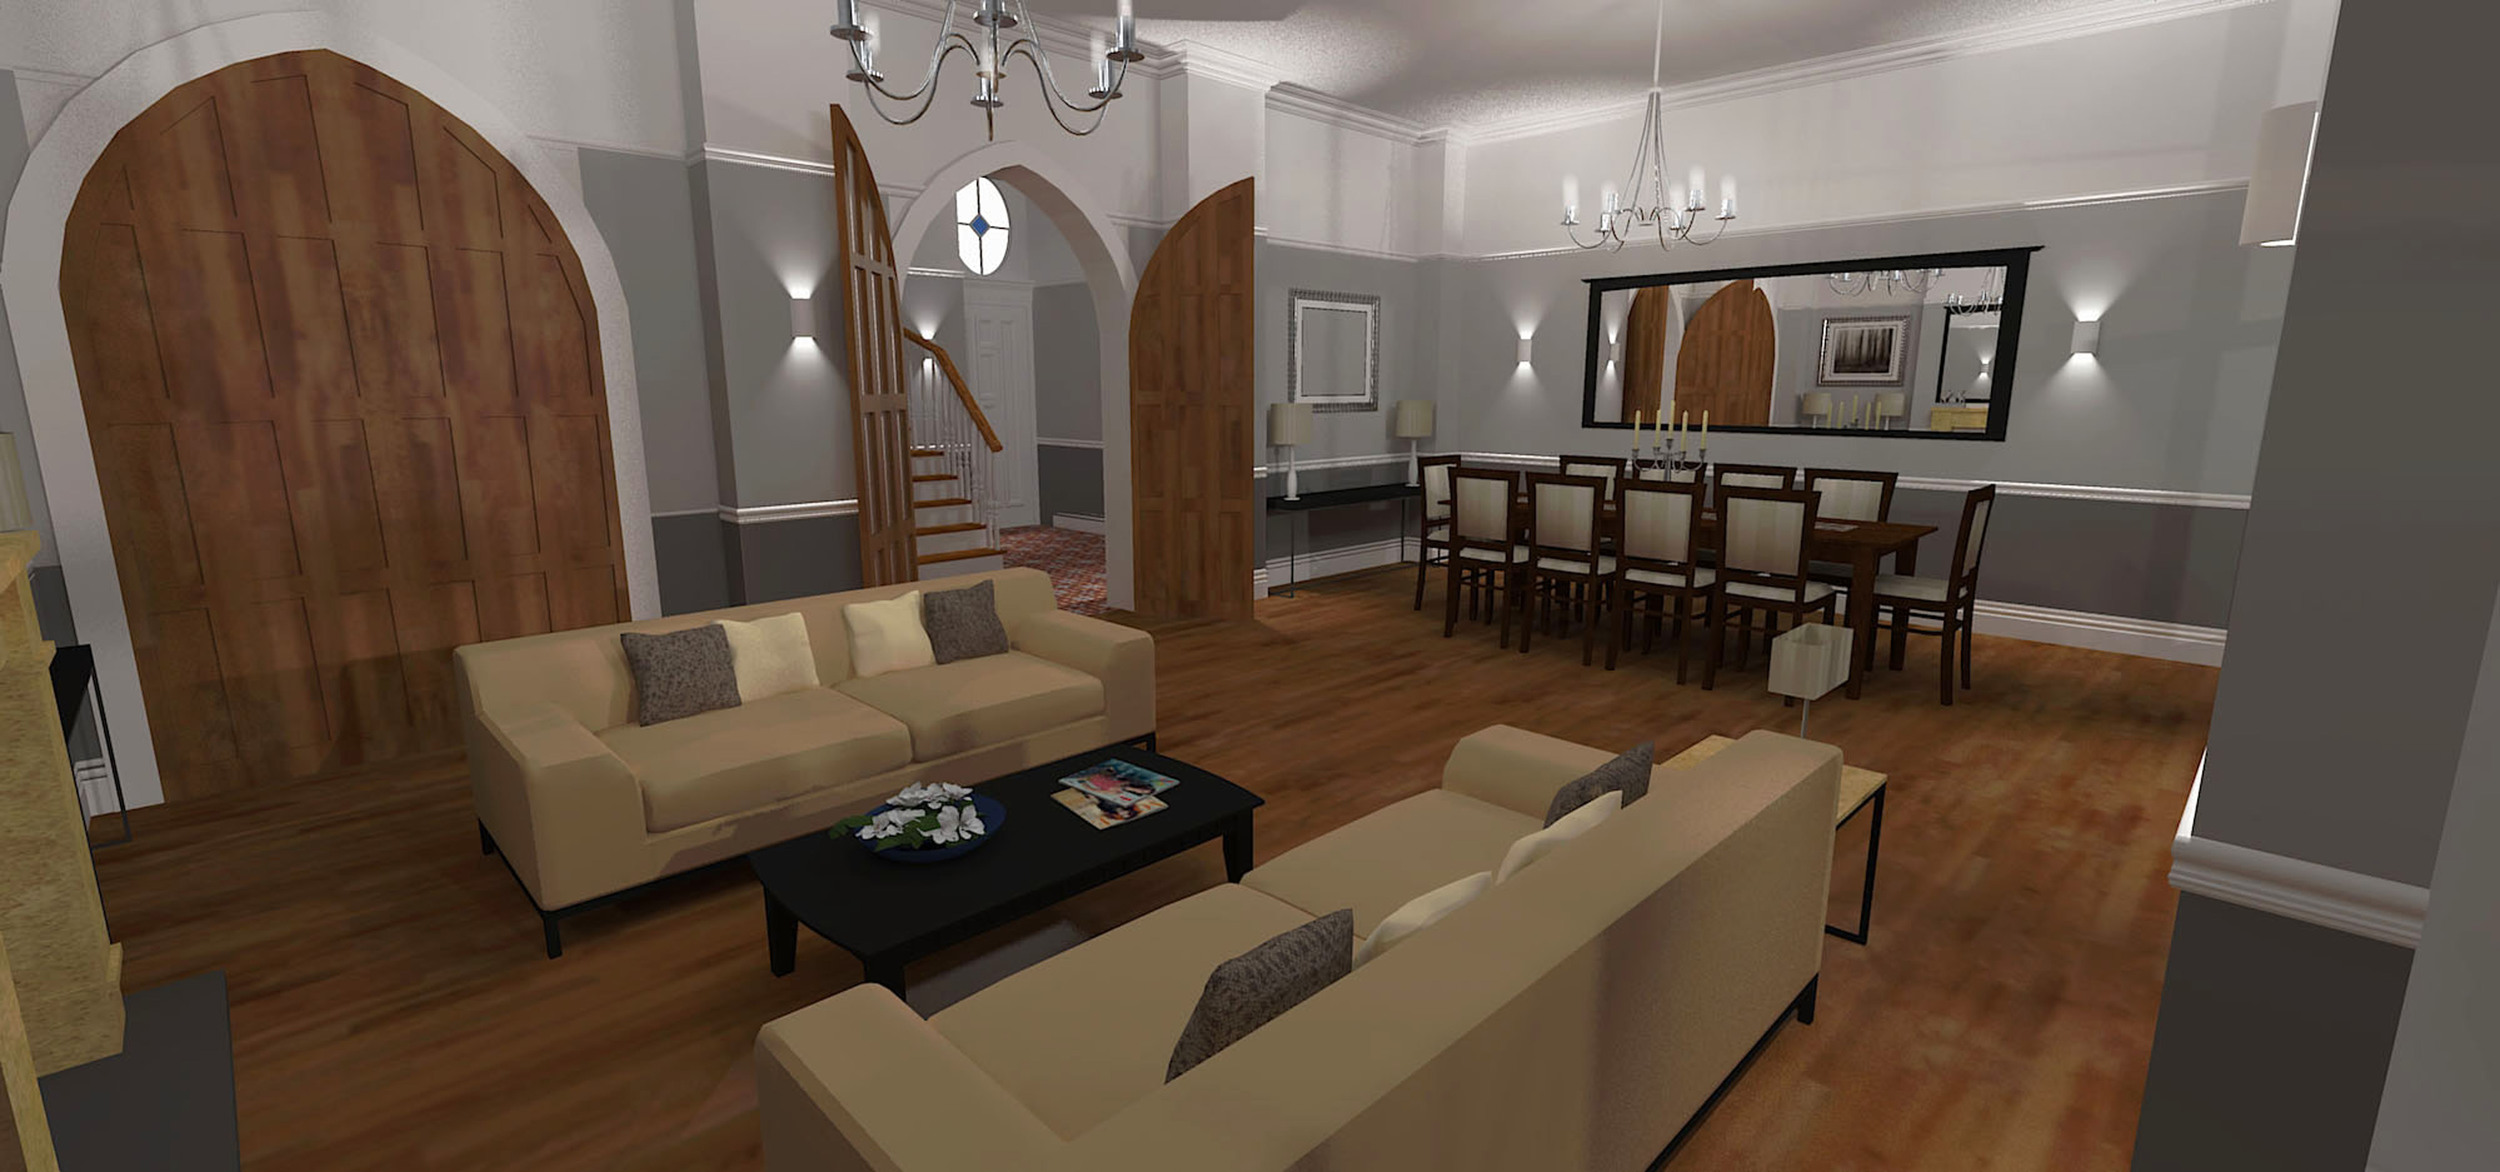 plot 5 living room_Scene 4c copy.jpg